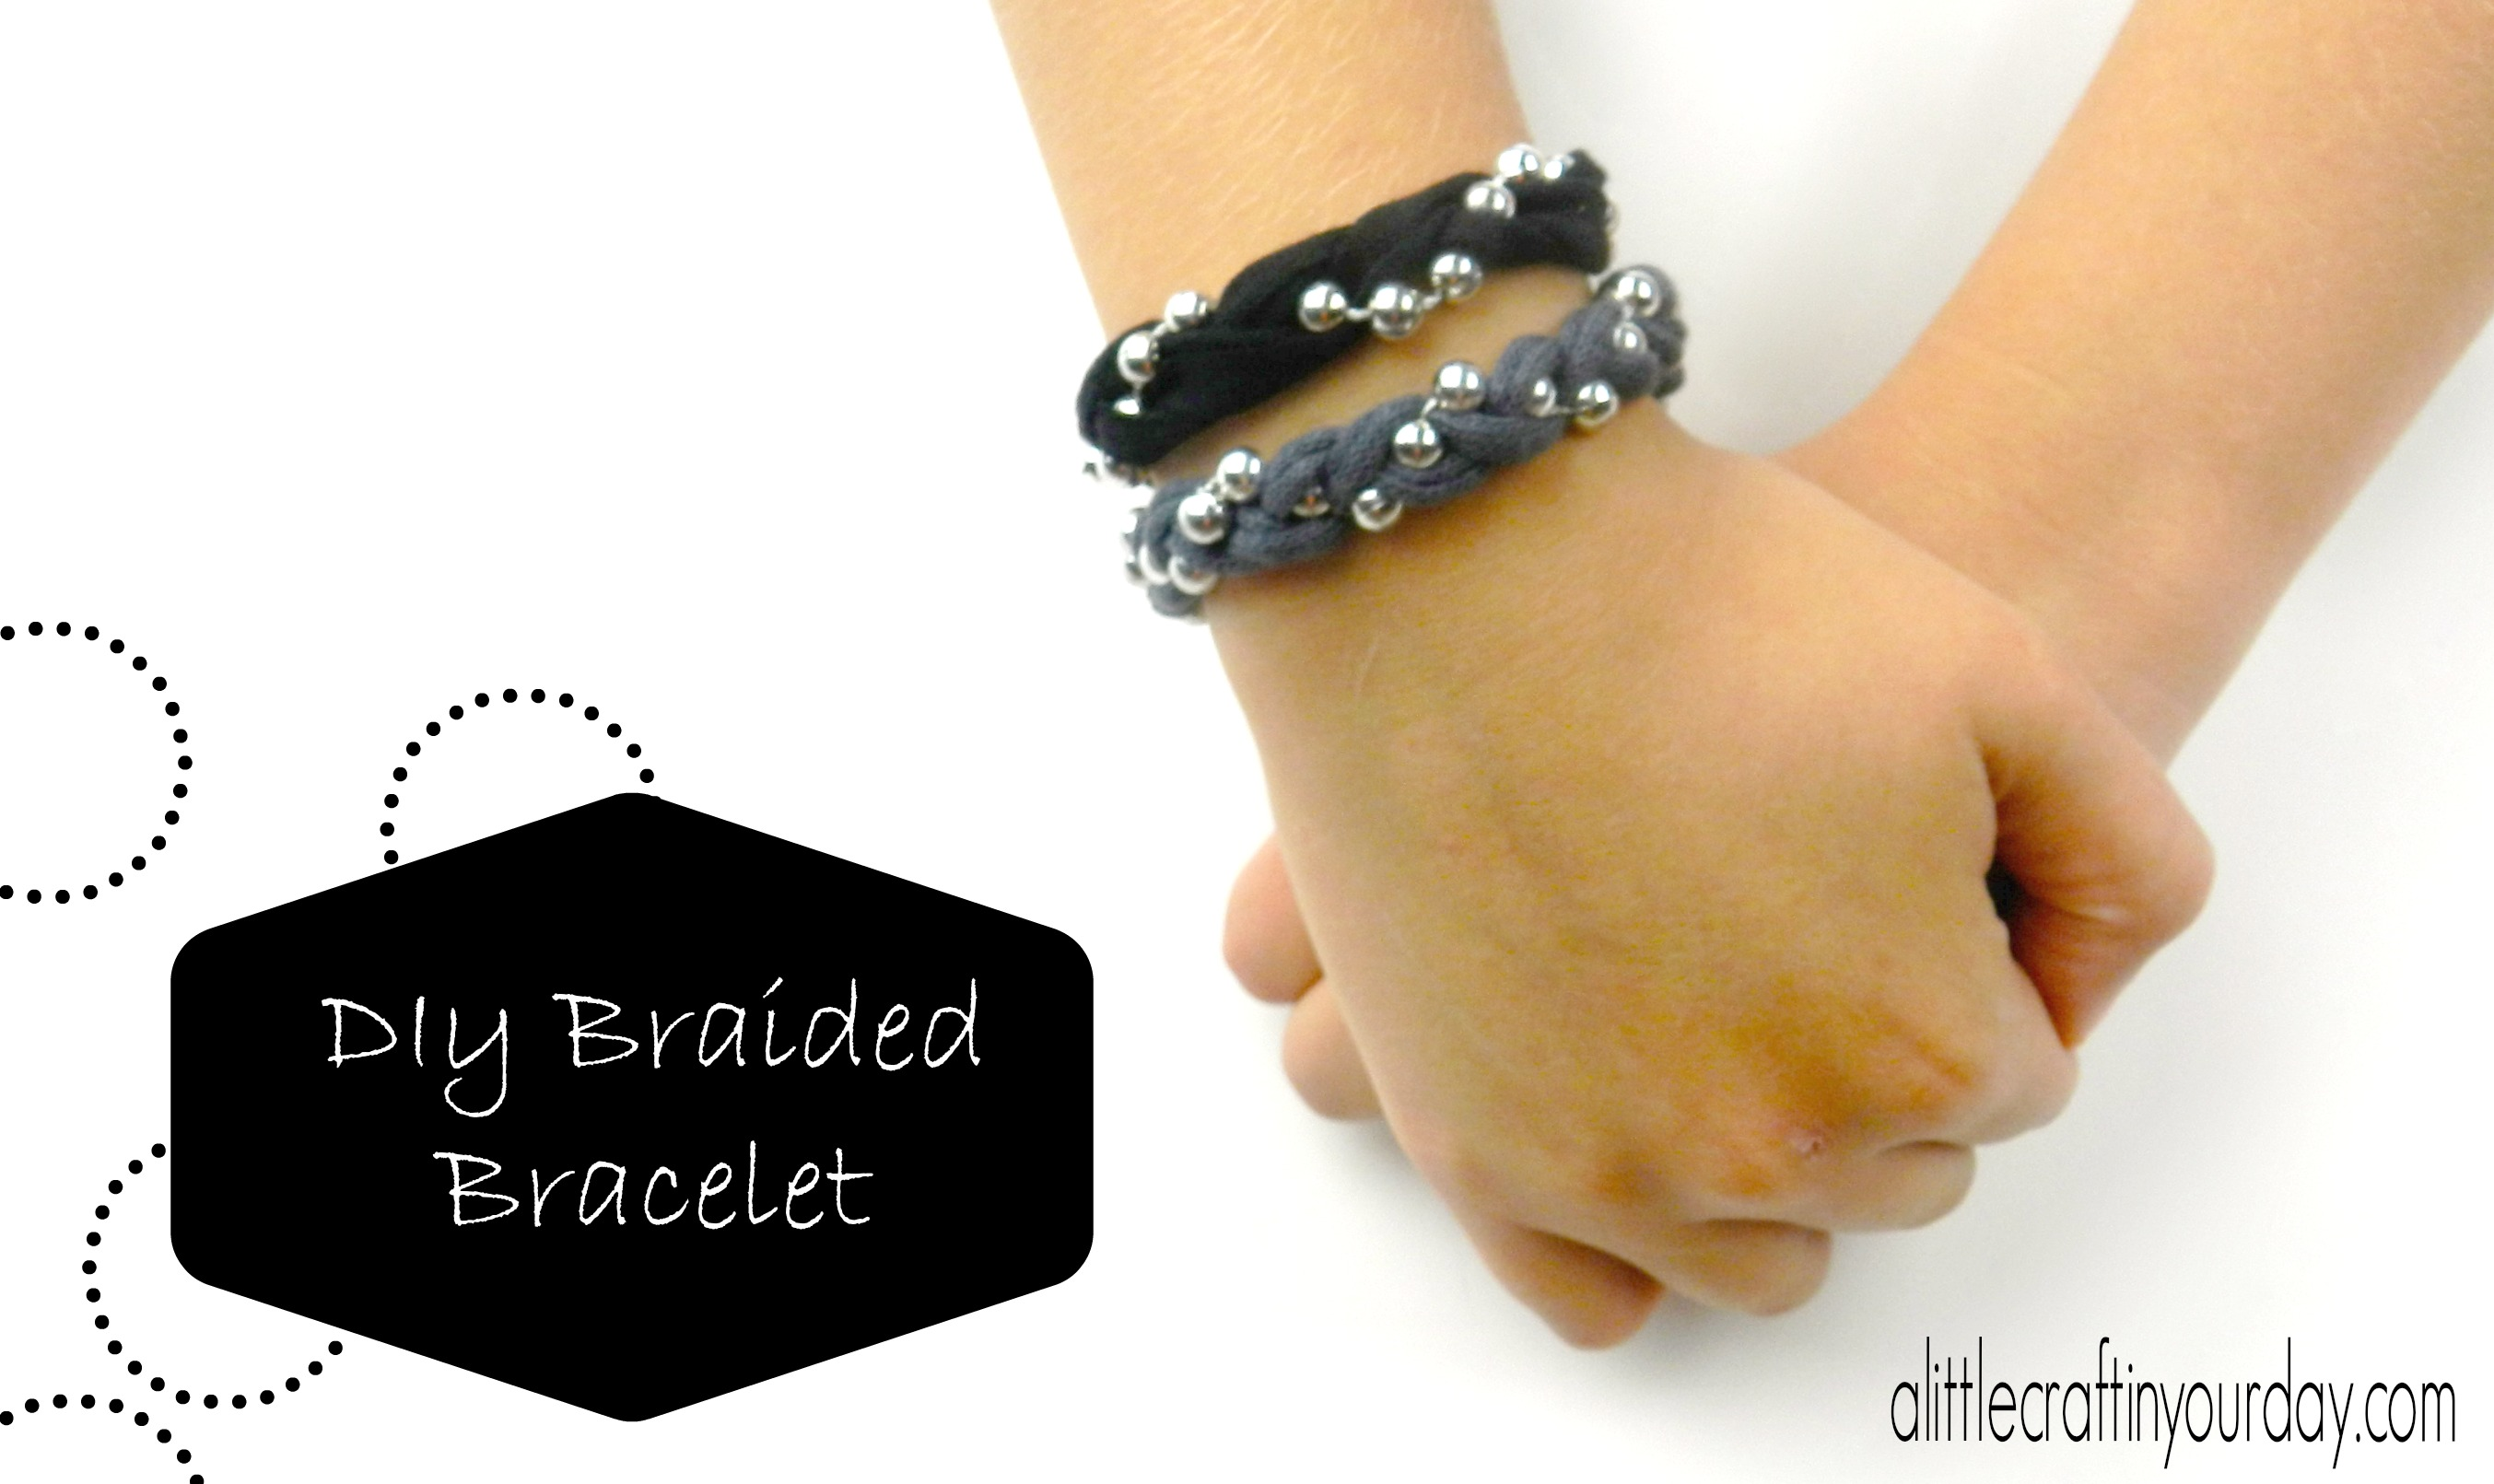 DIY_Braided_Bracelet